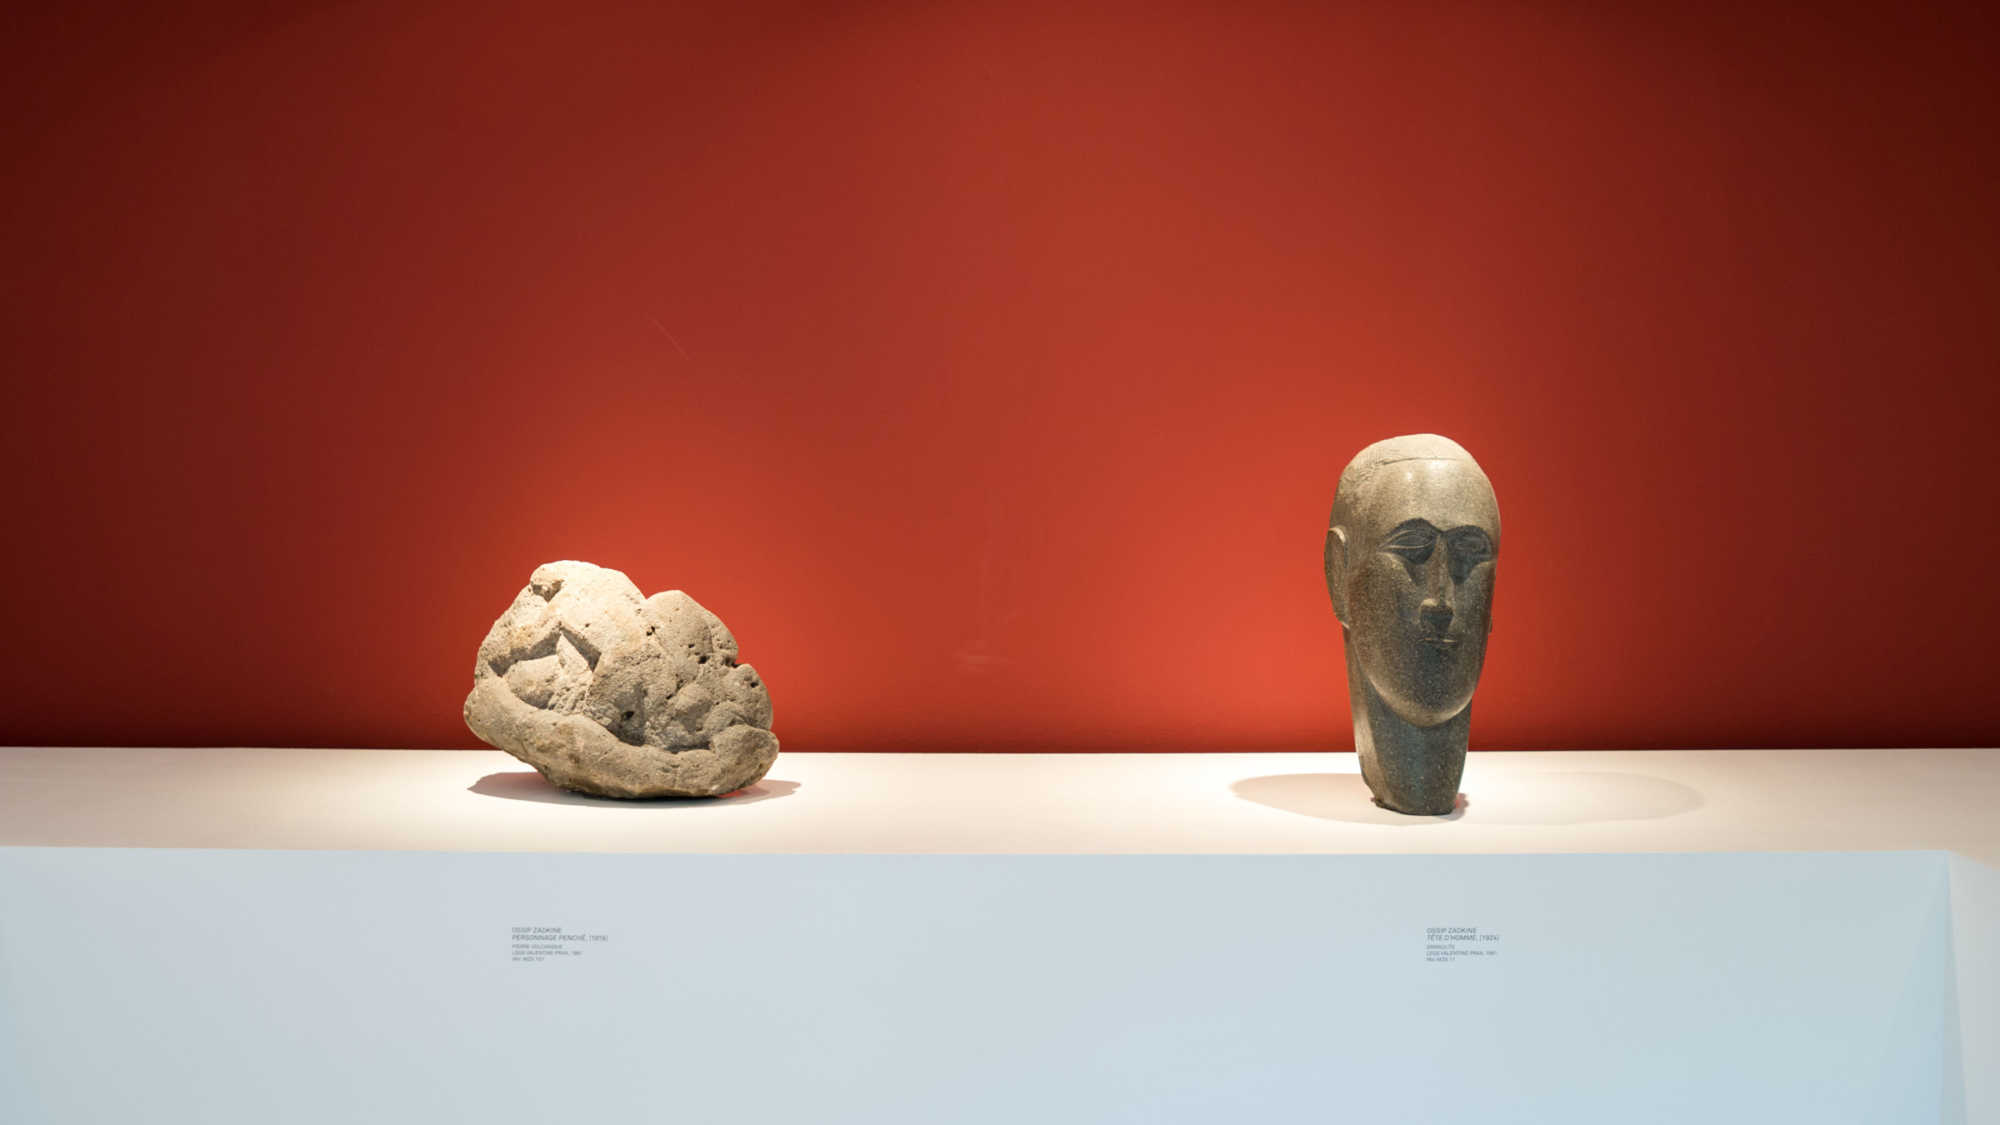 TheWaysBeyond - Musée Zadkine © TheWaysBeyond, 2019